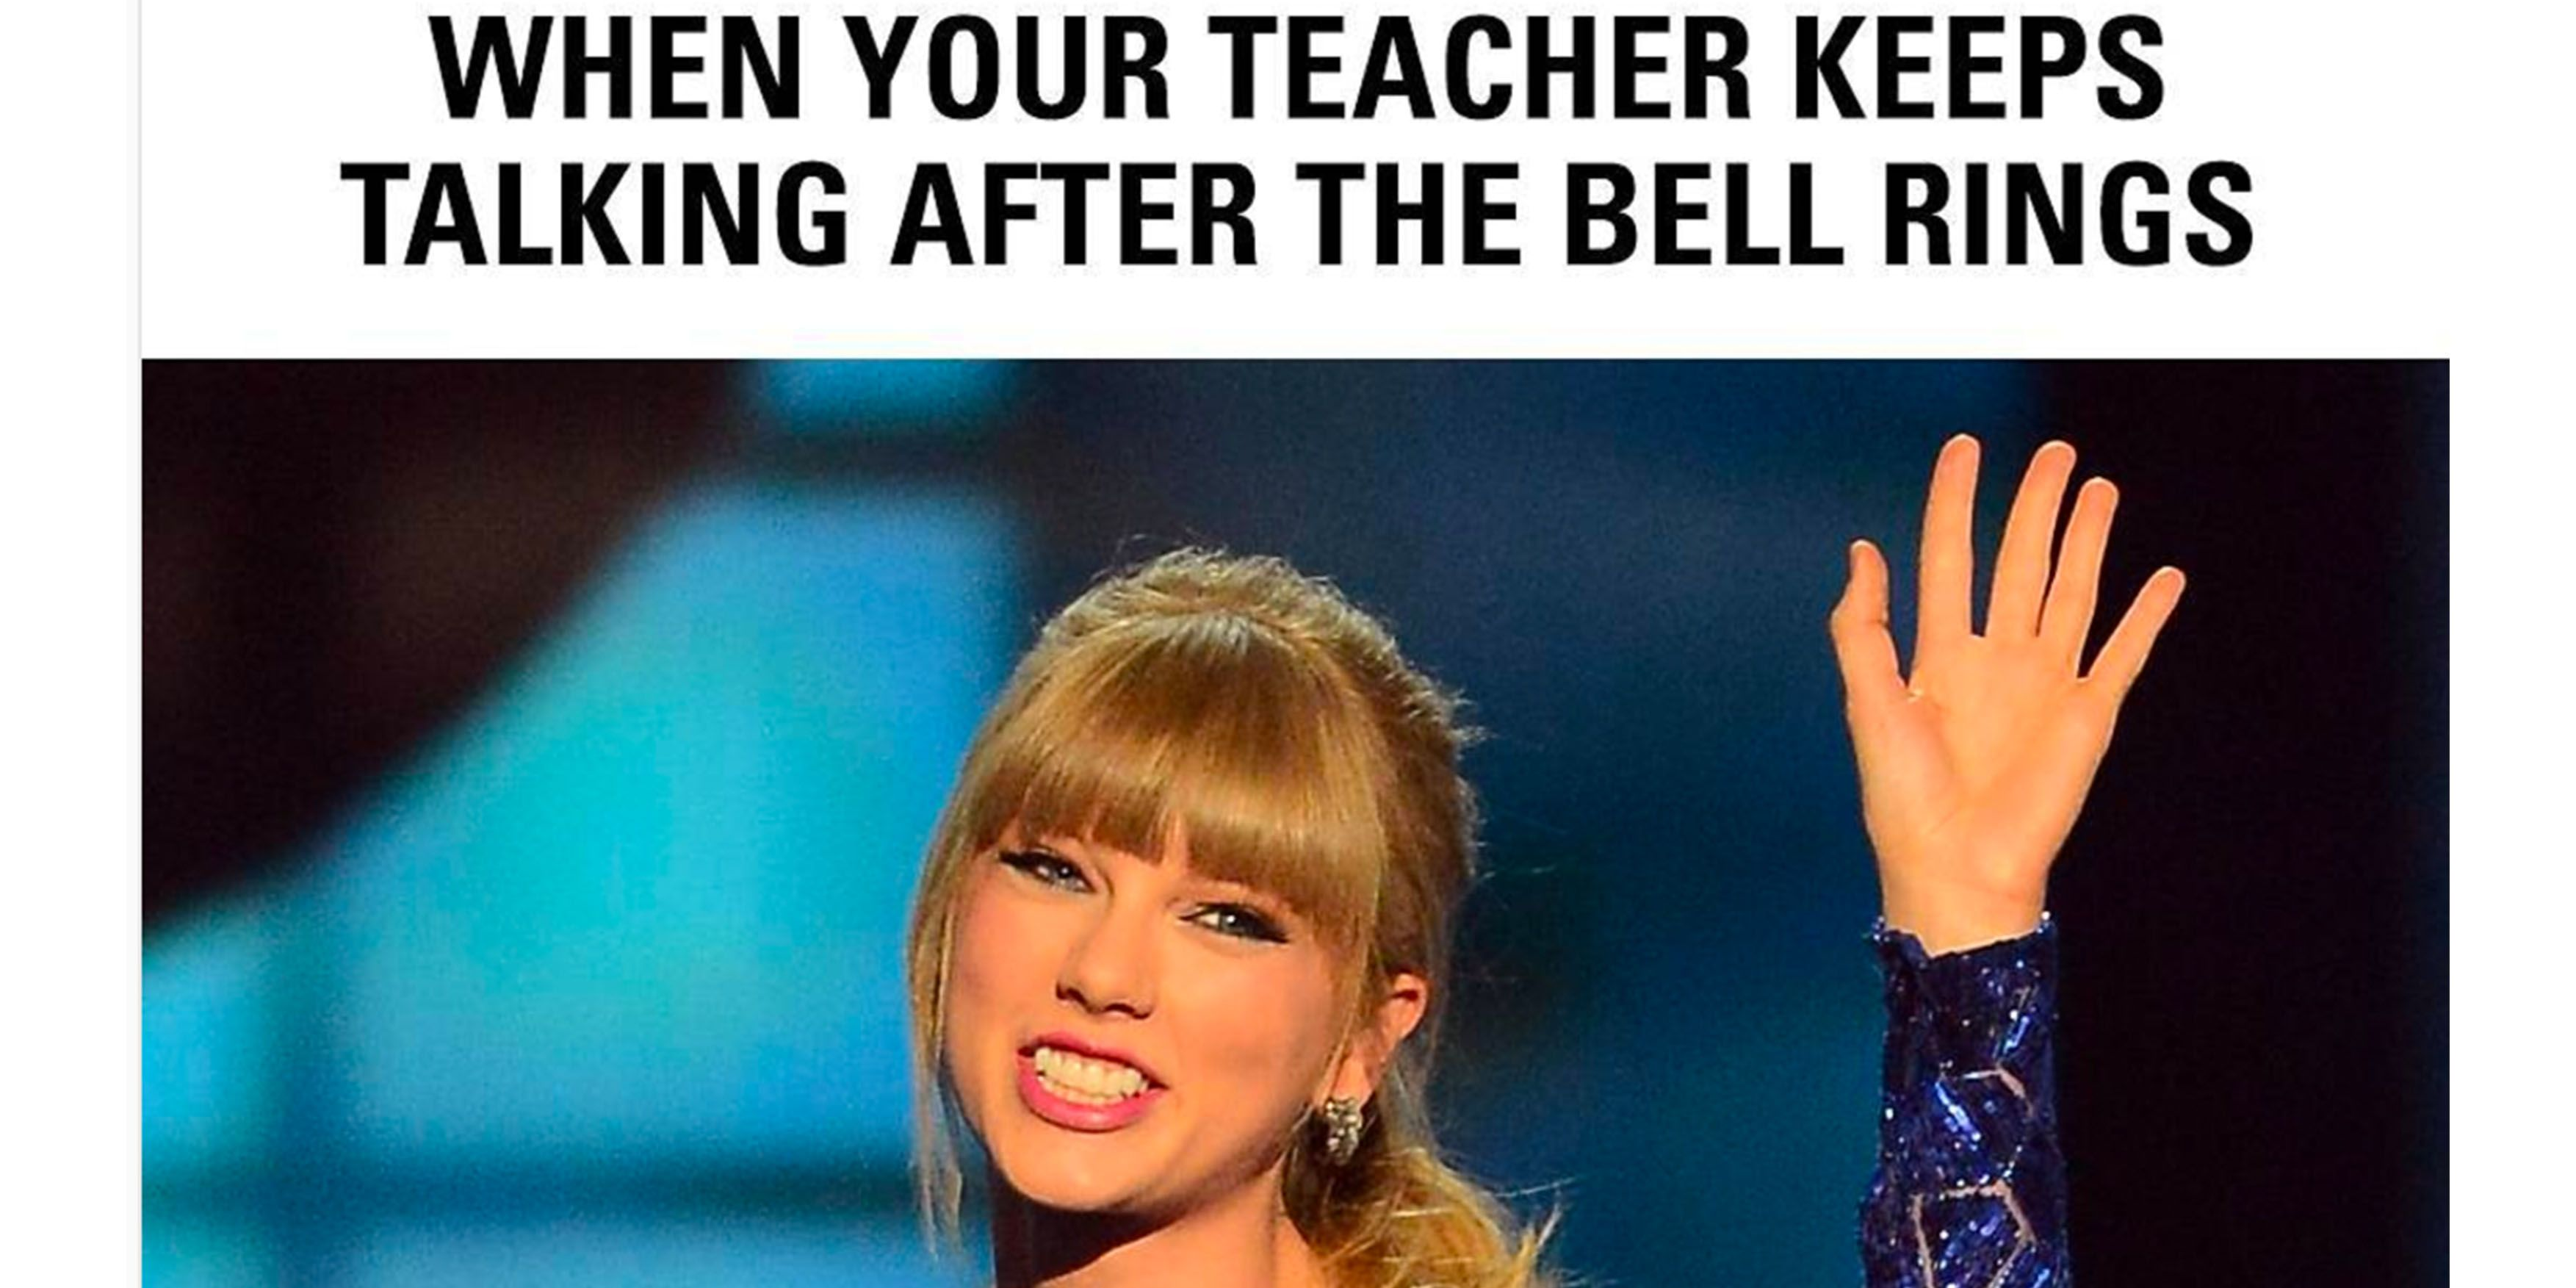 16 Funniest Teacher Memes 2018  Relatable Memes About Students